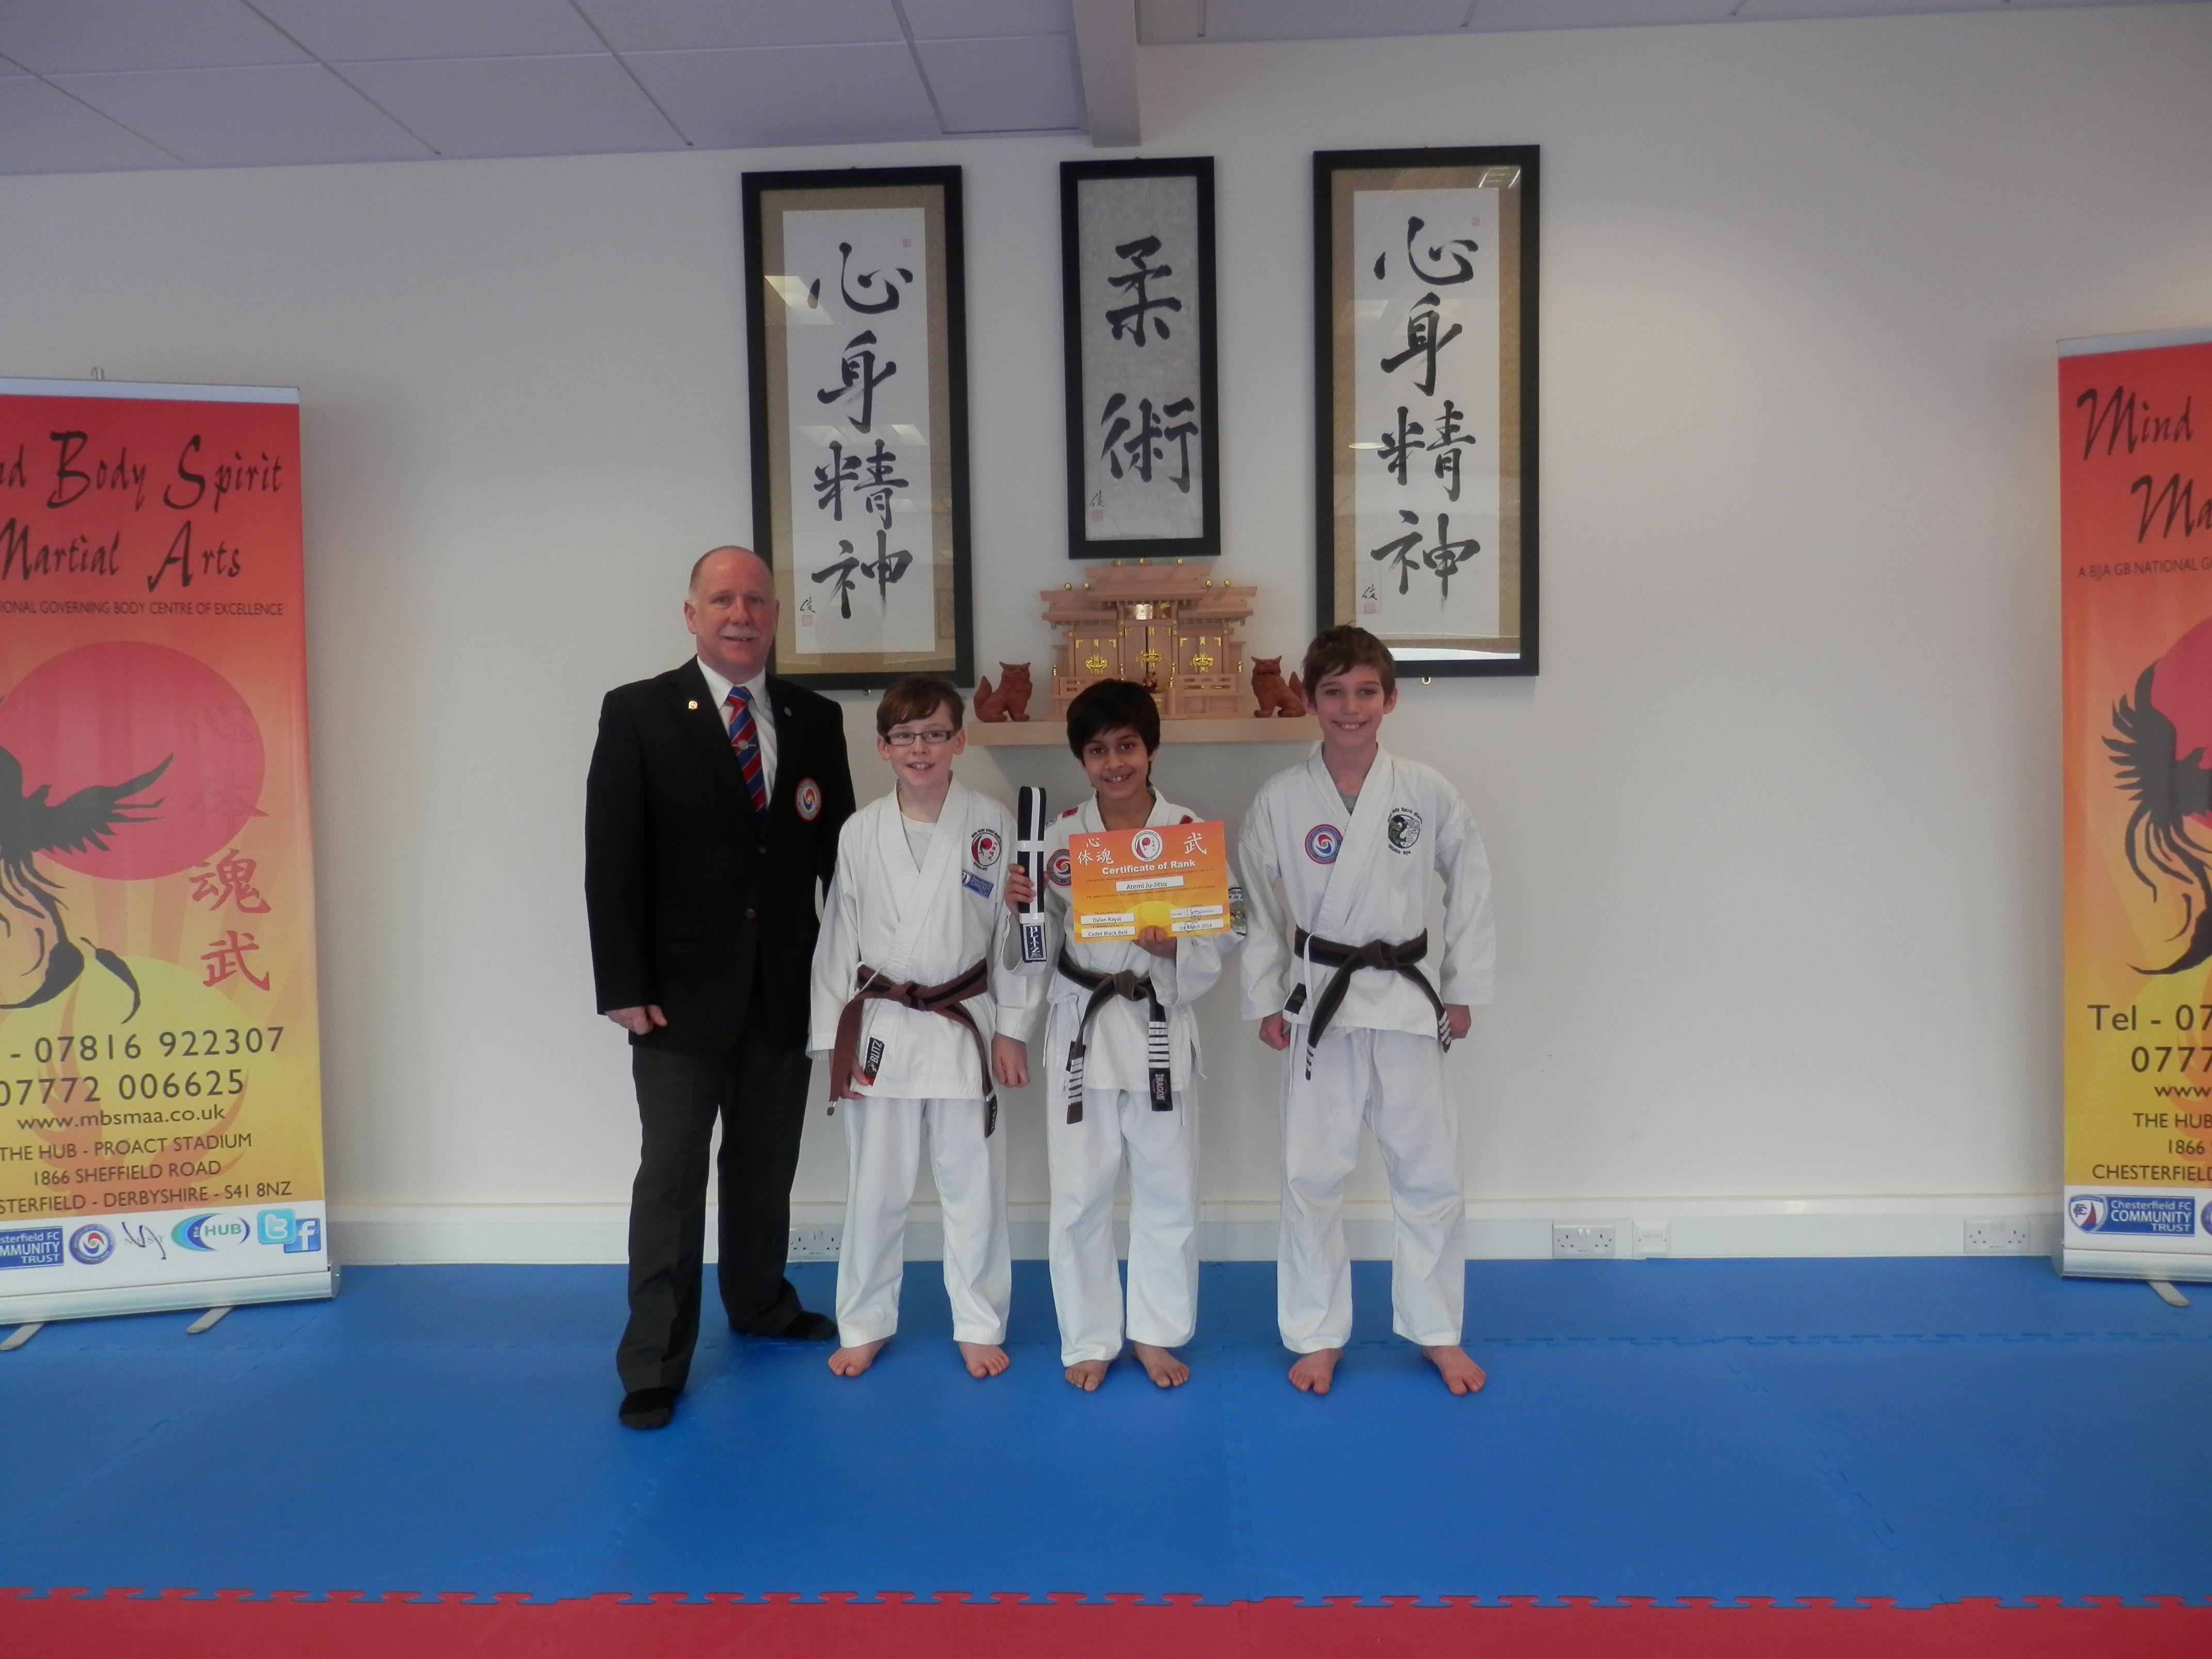 Successful Cadet Black Belt Uke S Mind Body Spirit